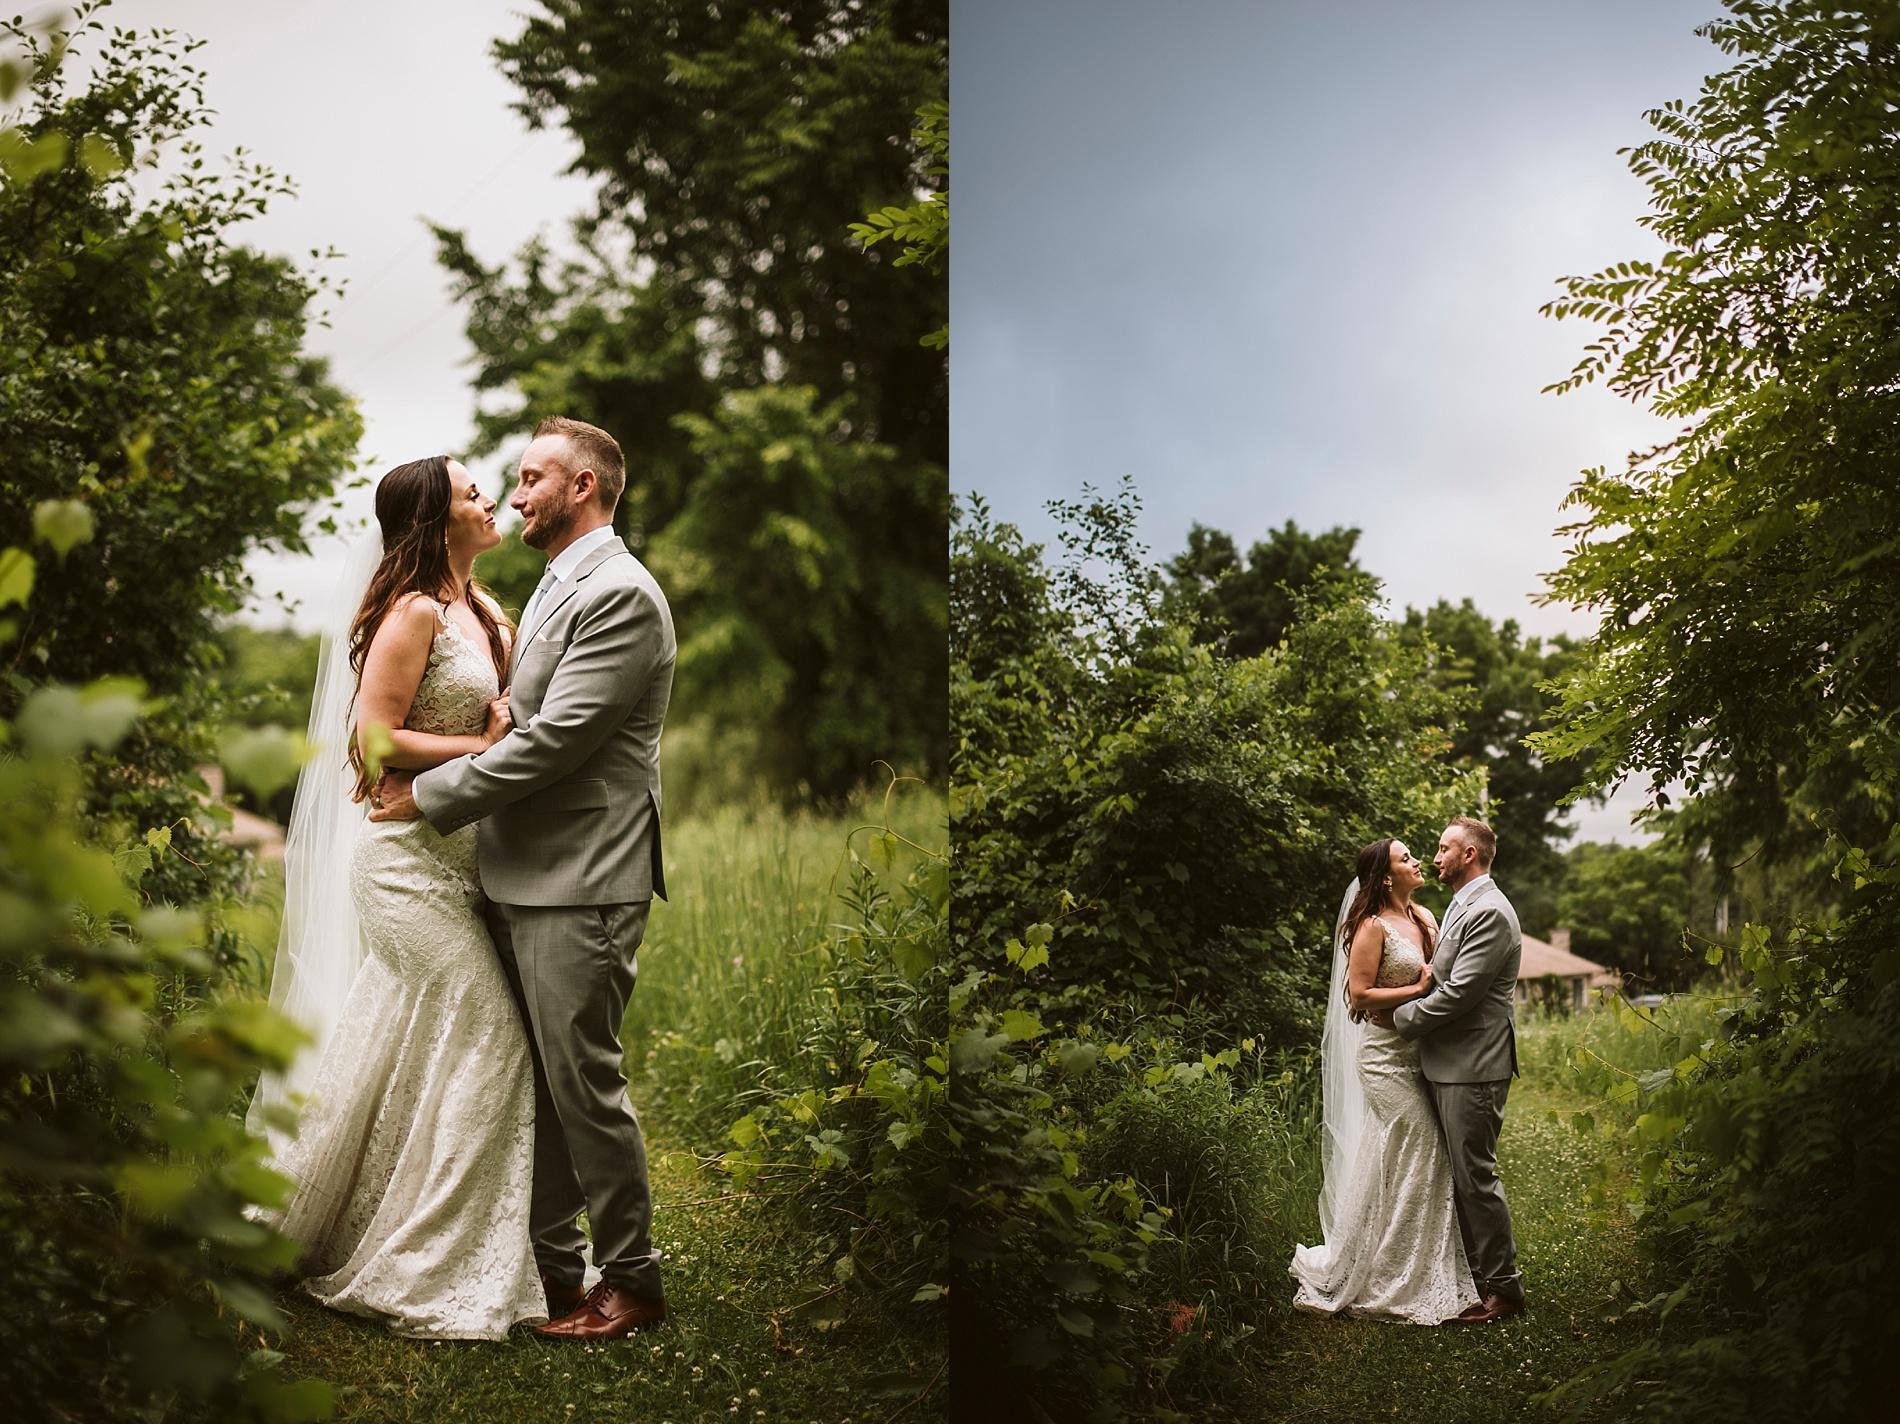 Kawartha_Lakes_Wedding_Bobcageon_Eganridge_Resort_Toronto_Photographer_0060.jpg